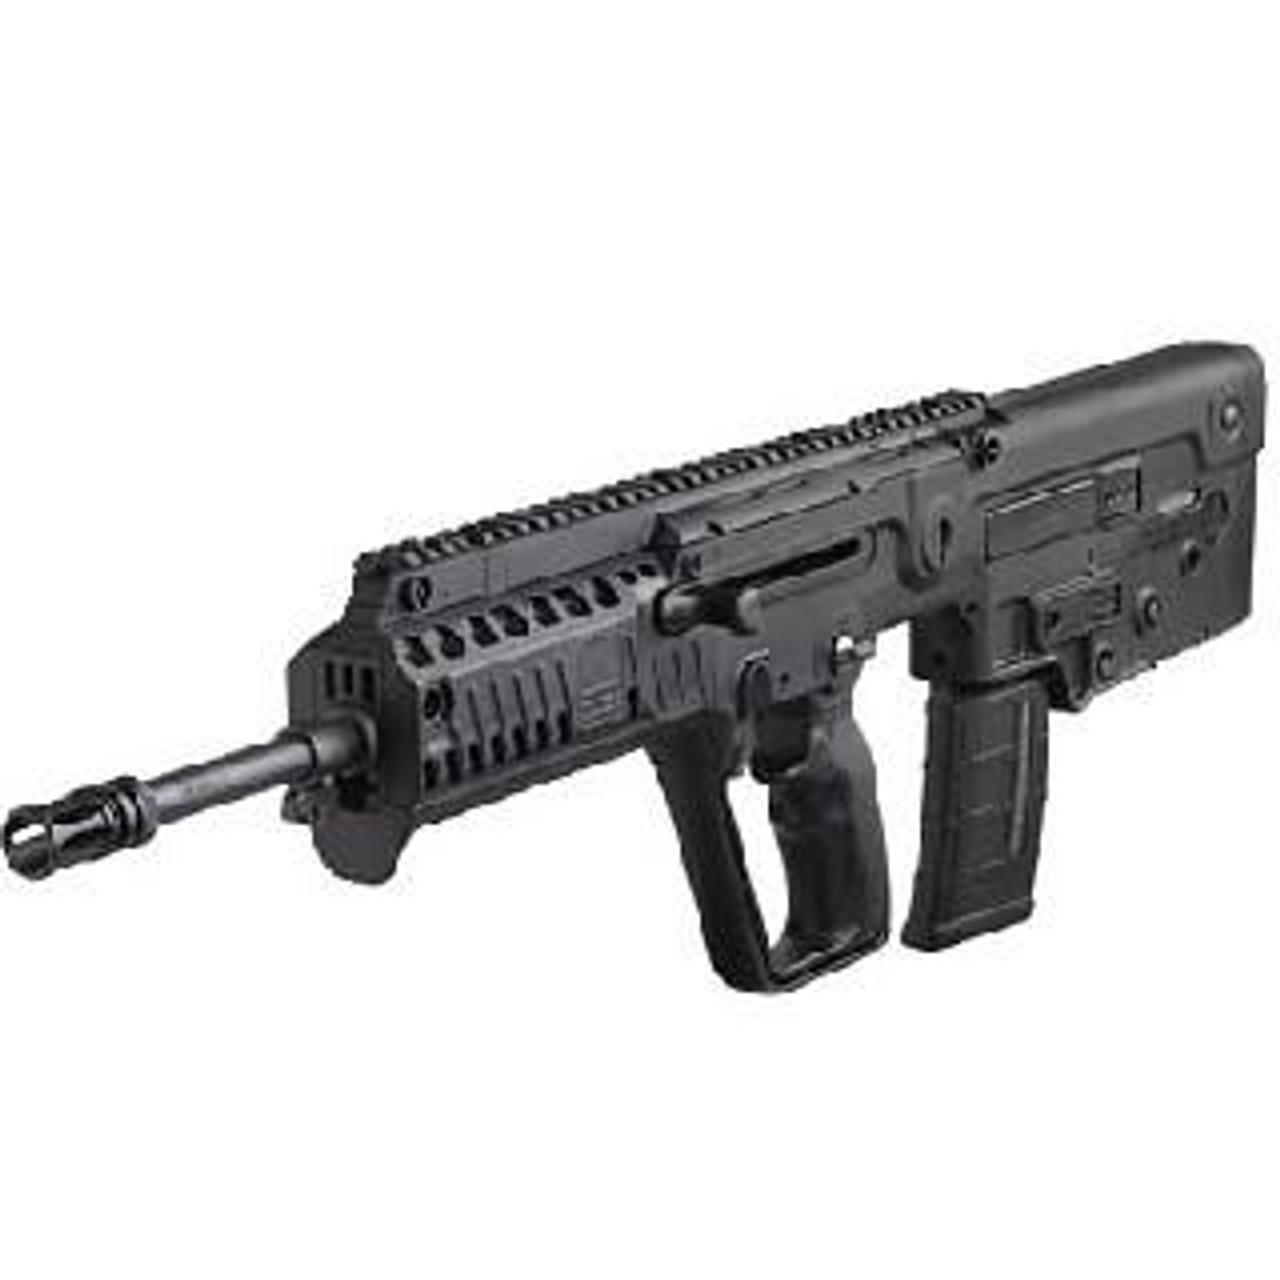 IWI Tavor X95 18in CALIFORNIA LEGAL- 5.56- Black